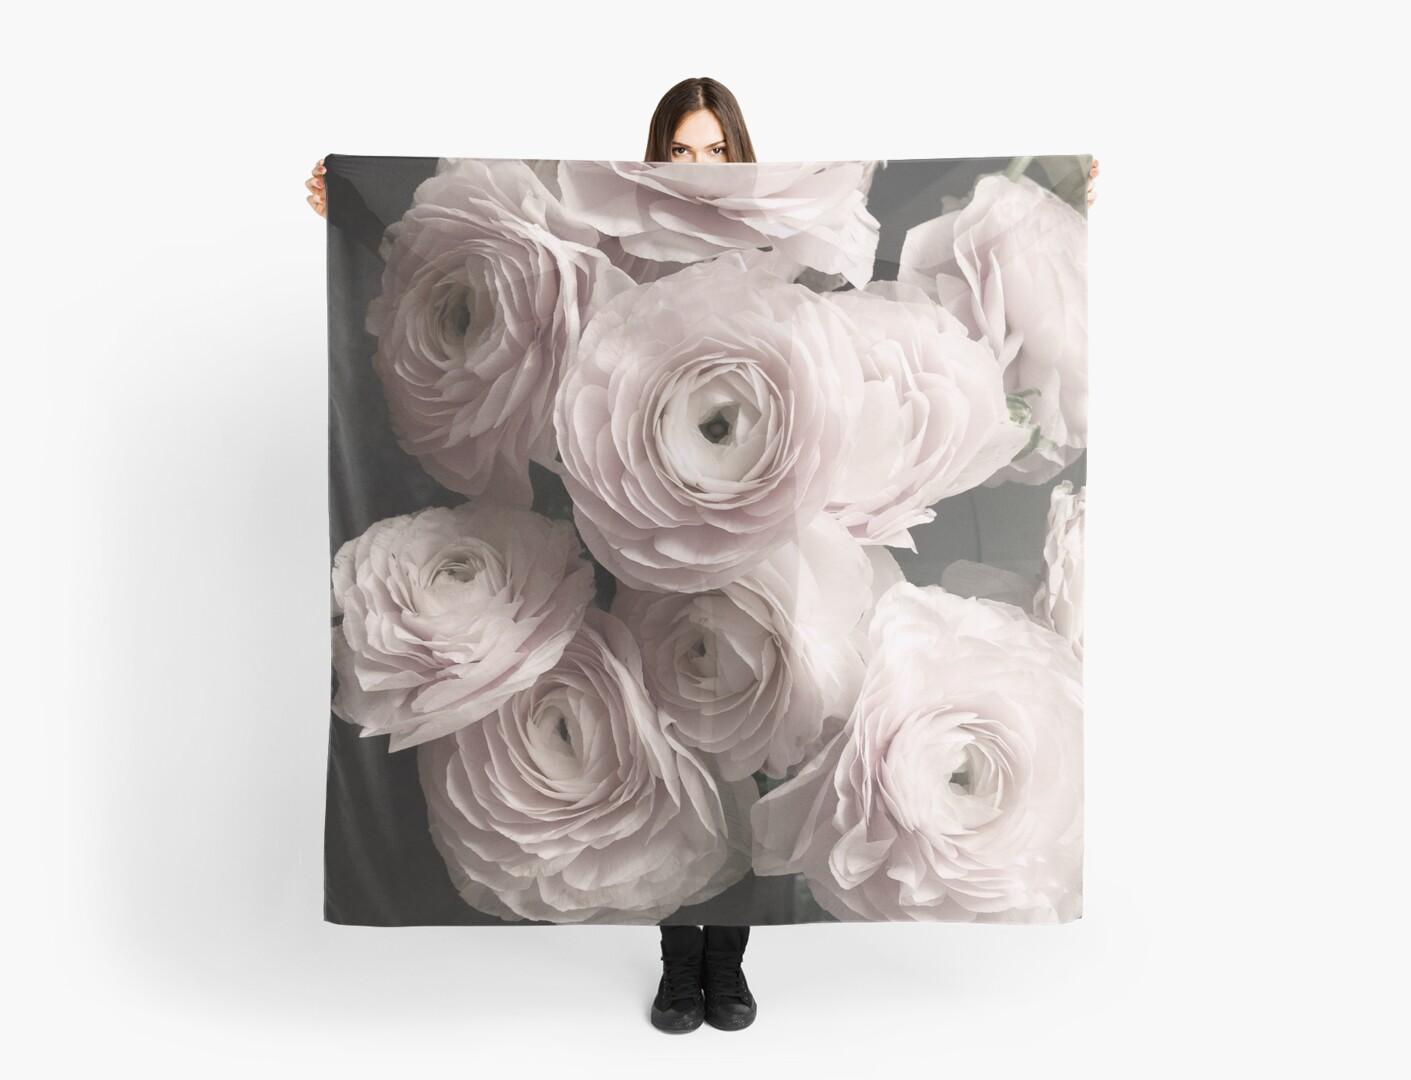 Blush Pink Roses Bouquet Rose Flowers Scarves By Natalie Digital